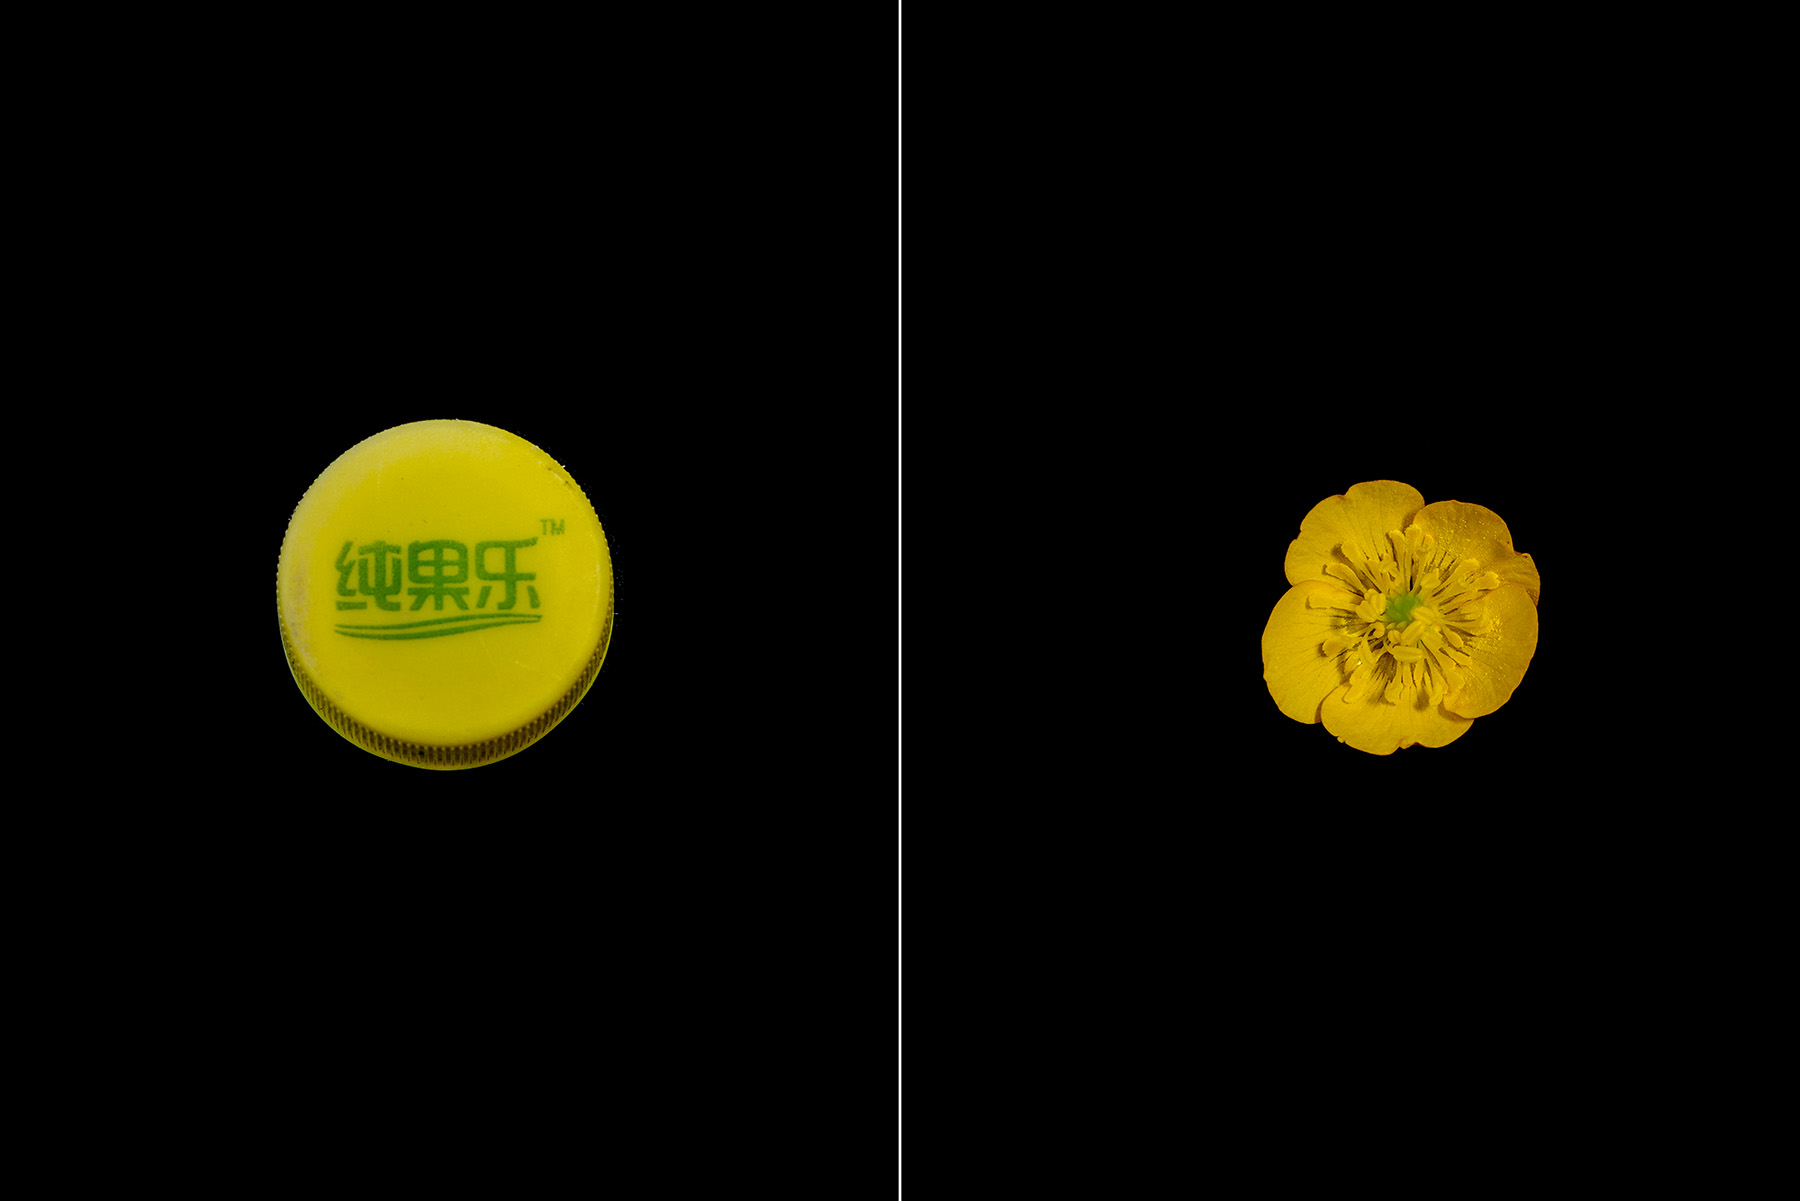 YellowCap_YellowFlower_Prints_6x4_Plastic_NaturalComparrison.jpg